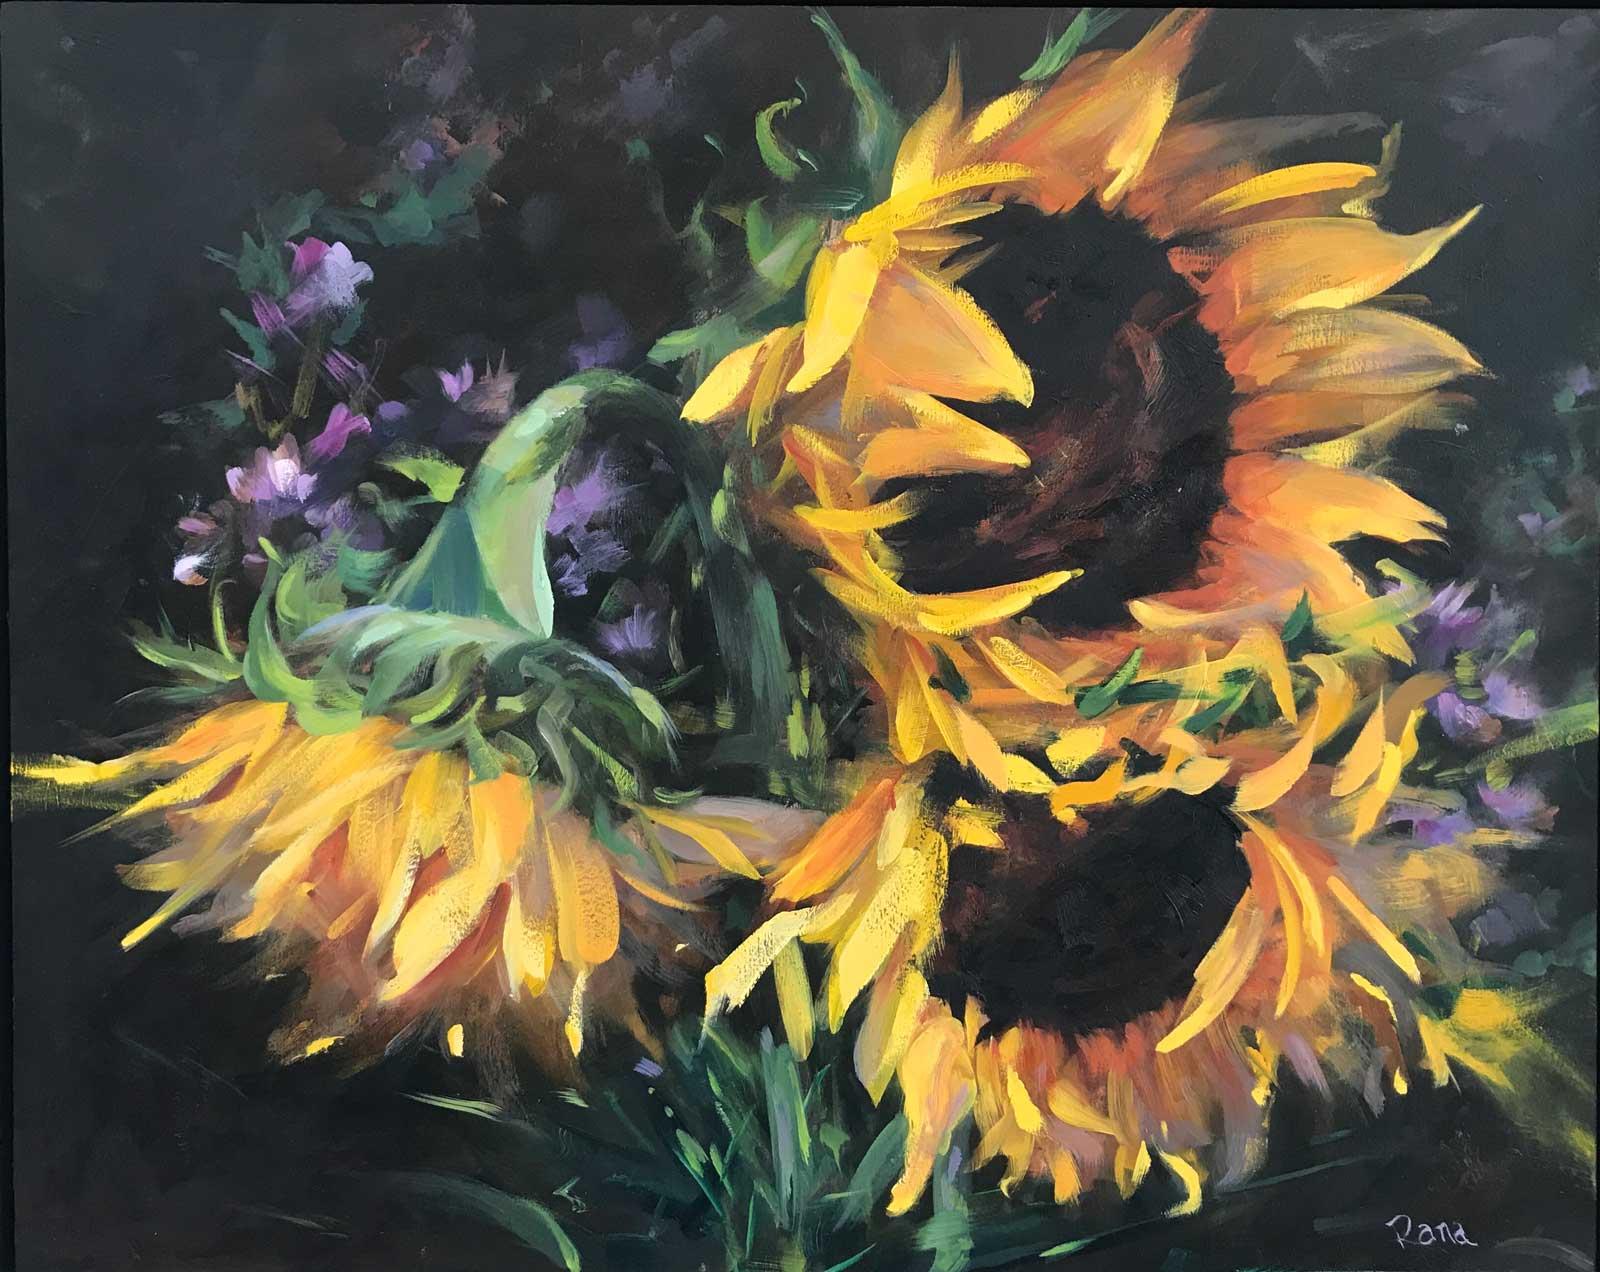 Rana Jordahl, Sunny Days, 12x16 Oil on board